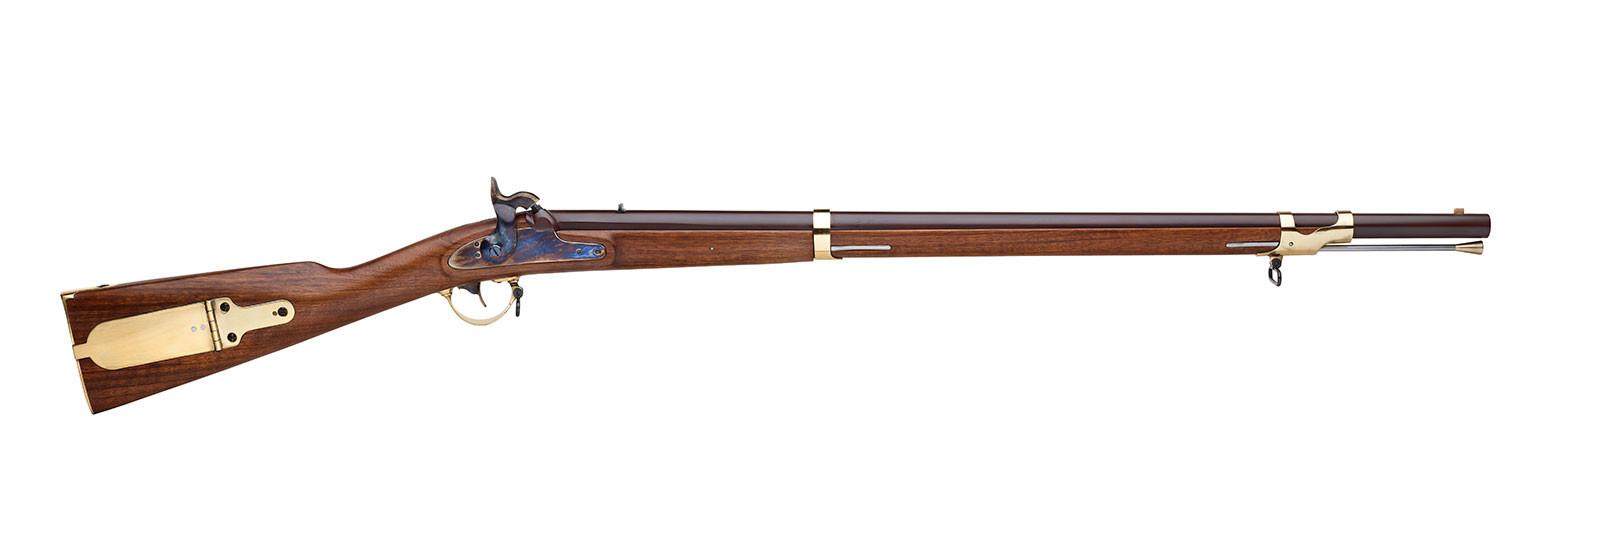 Mississippi rifle .58